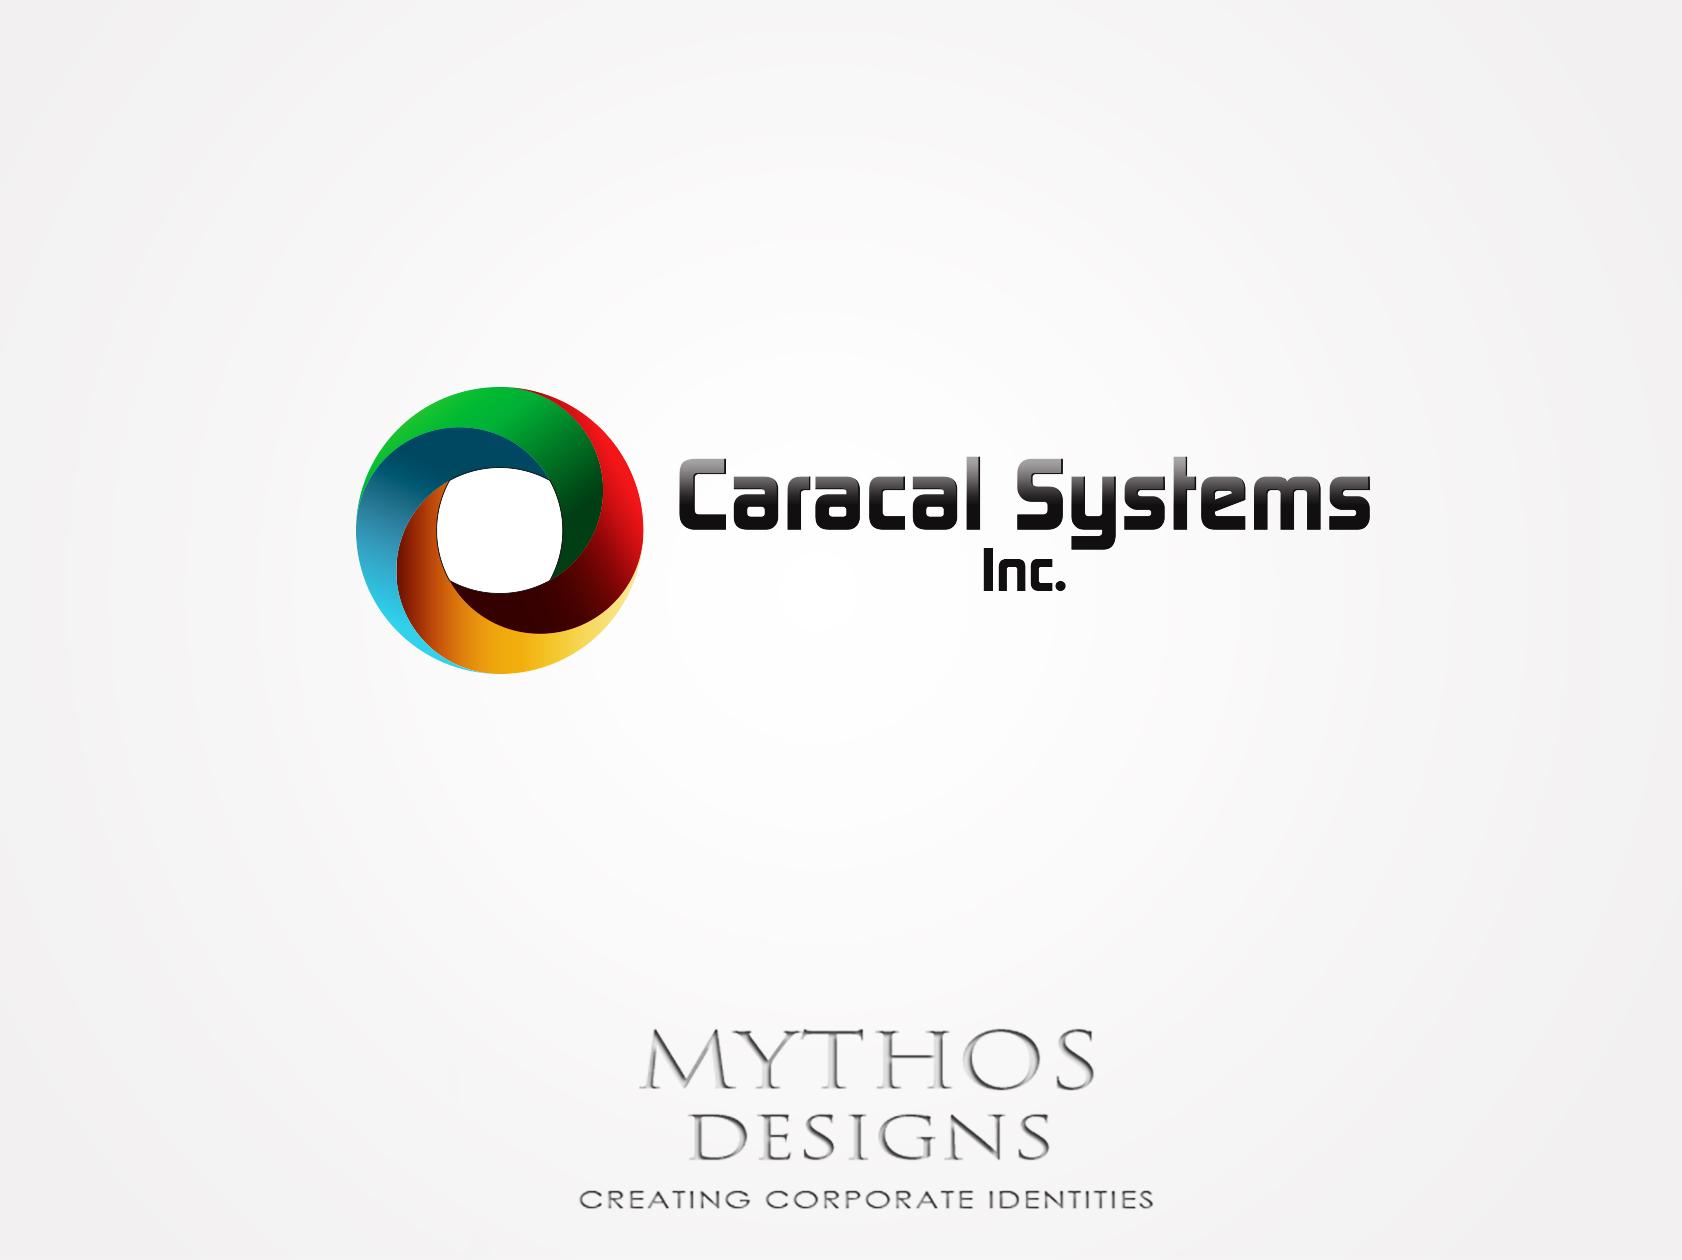 Logo Design by Mythos Designs - Entry No. 110 in the Logo Design Contest Inspiring Logo Design for Caracal Systems Inc..